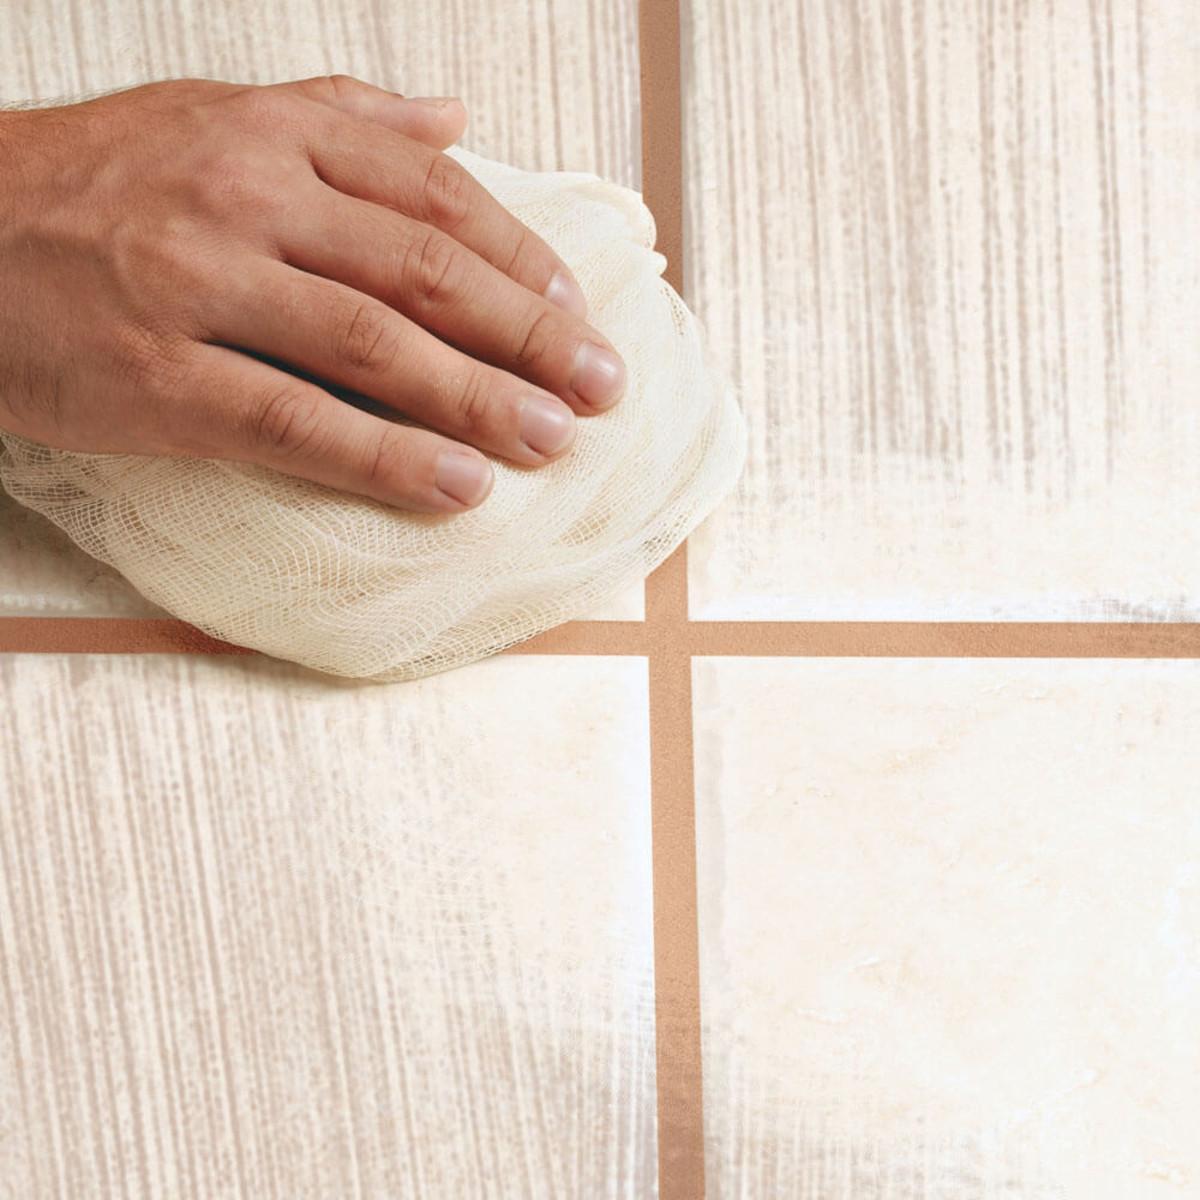 Polishing Cheesecloth ceramic tile